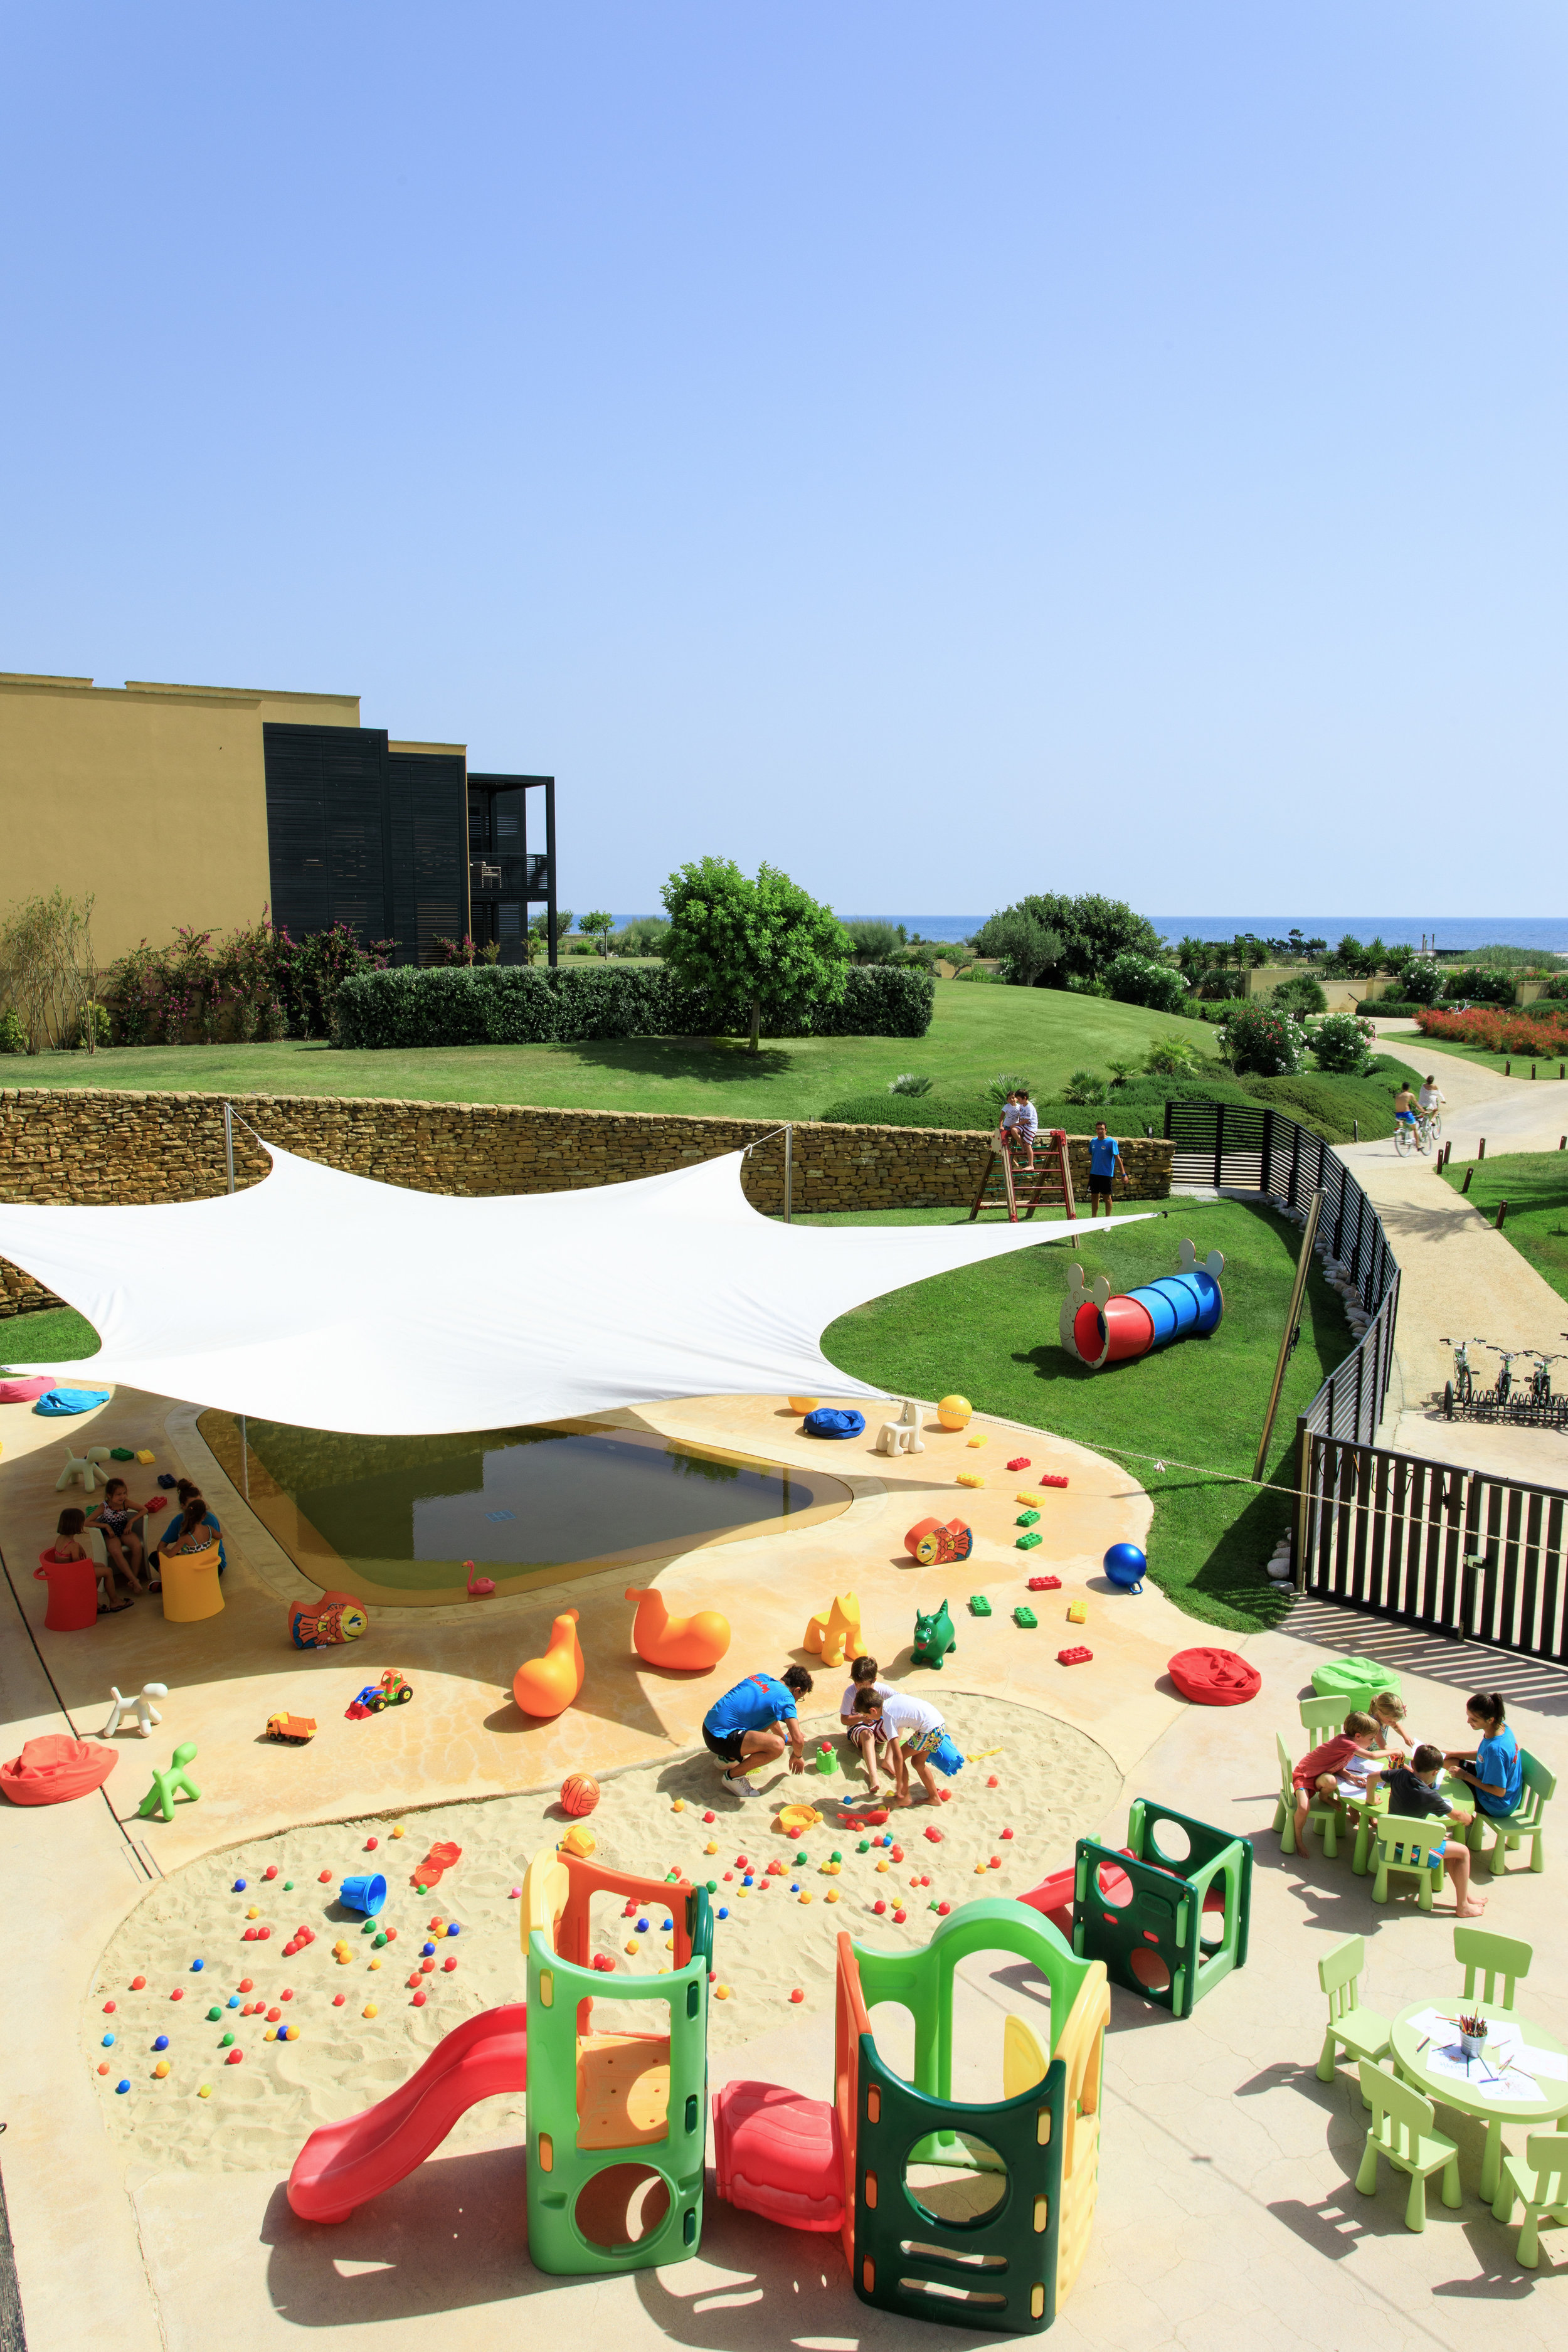 27 Families R Forte at Verdura Resort - Verduland Kids Club 4632 Jul 17.JPG